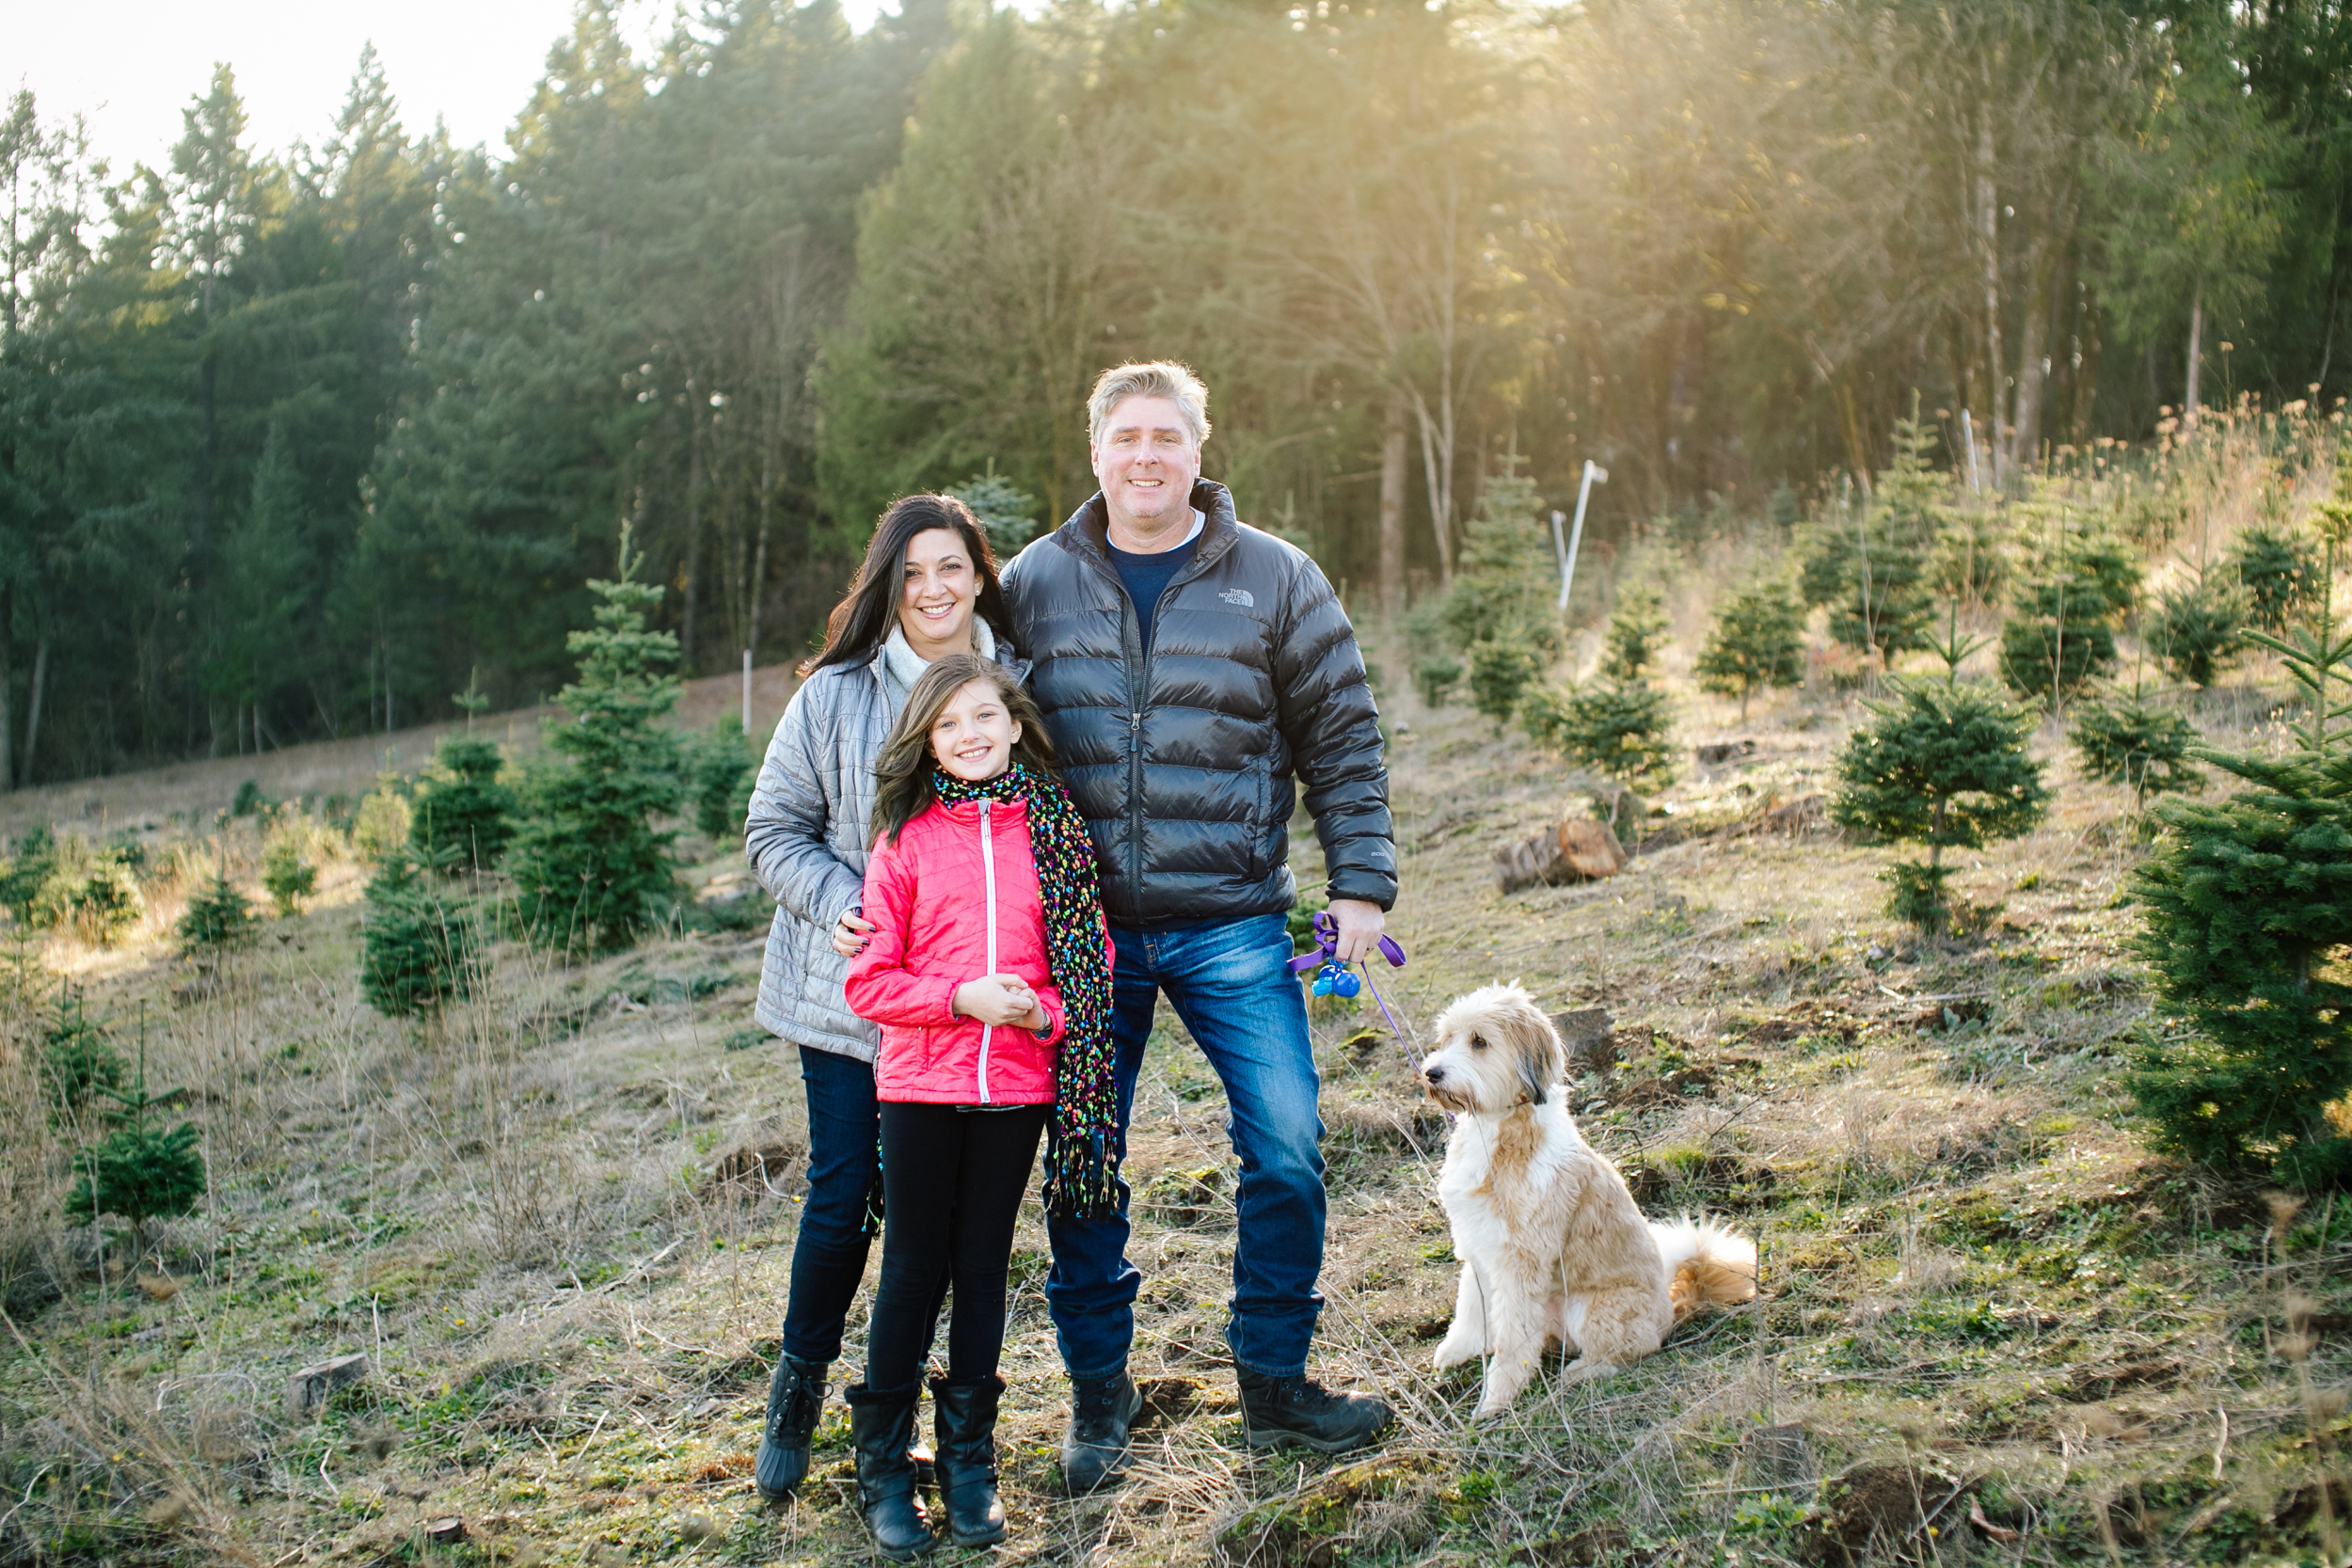 sleighbells-of-sherwood-family-photos-2.jpg